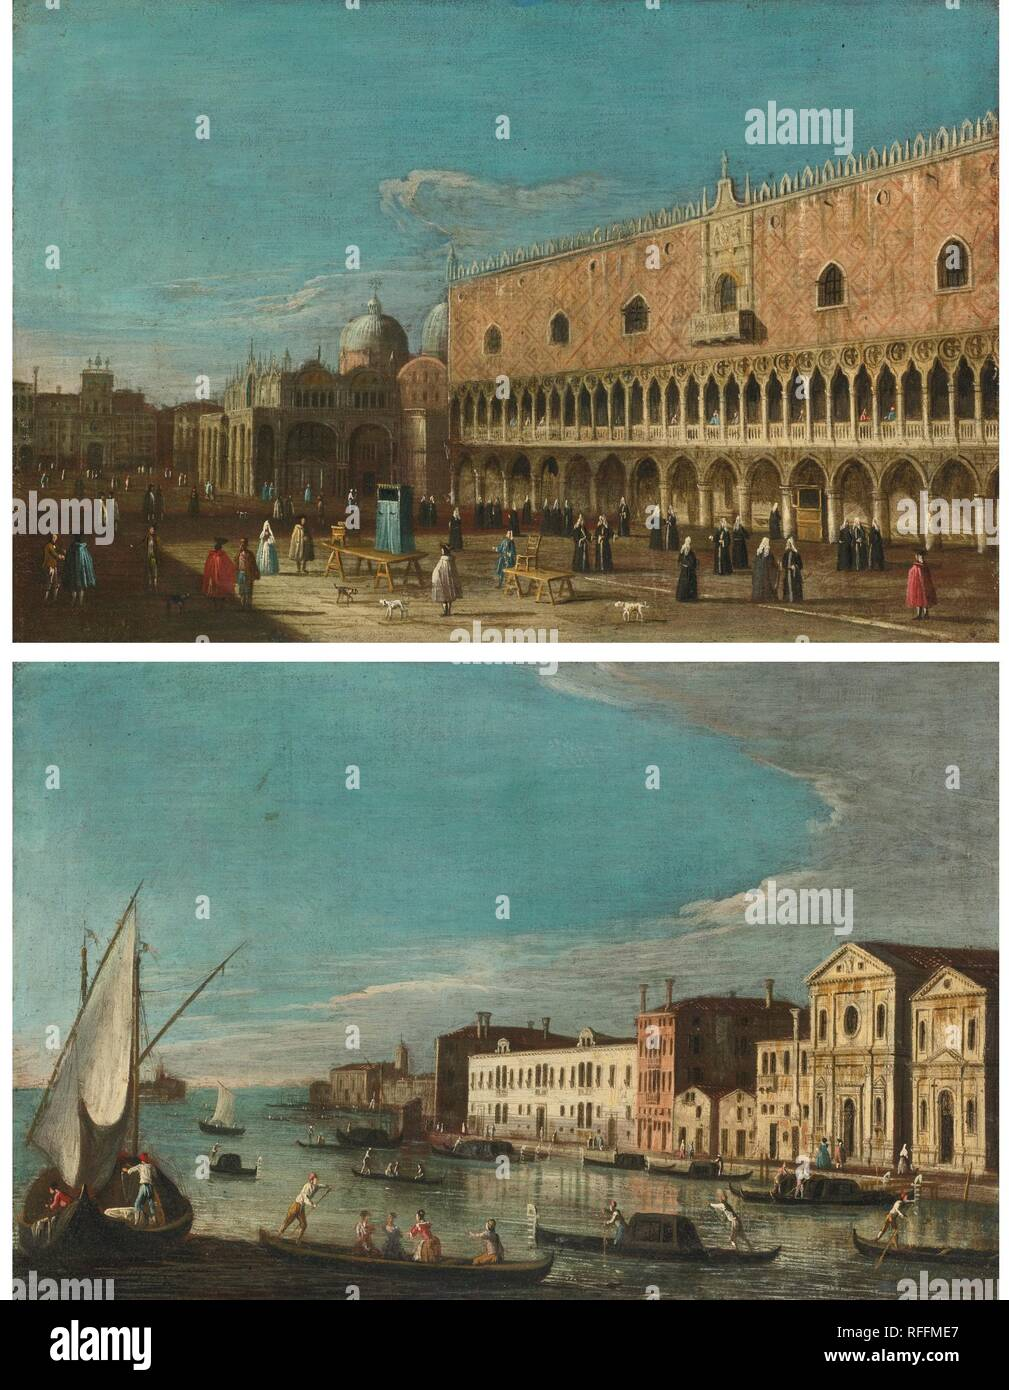 The Master of the Langmatt Foundation Views ACTIVE VENICE CIRCA 1740-1770 VENICE, A VIEW OF THE DOGE'S PALACE LOOKING TOWARDS SAINT MARK'S.jpg - RFFME7  - Stock Image